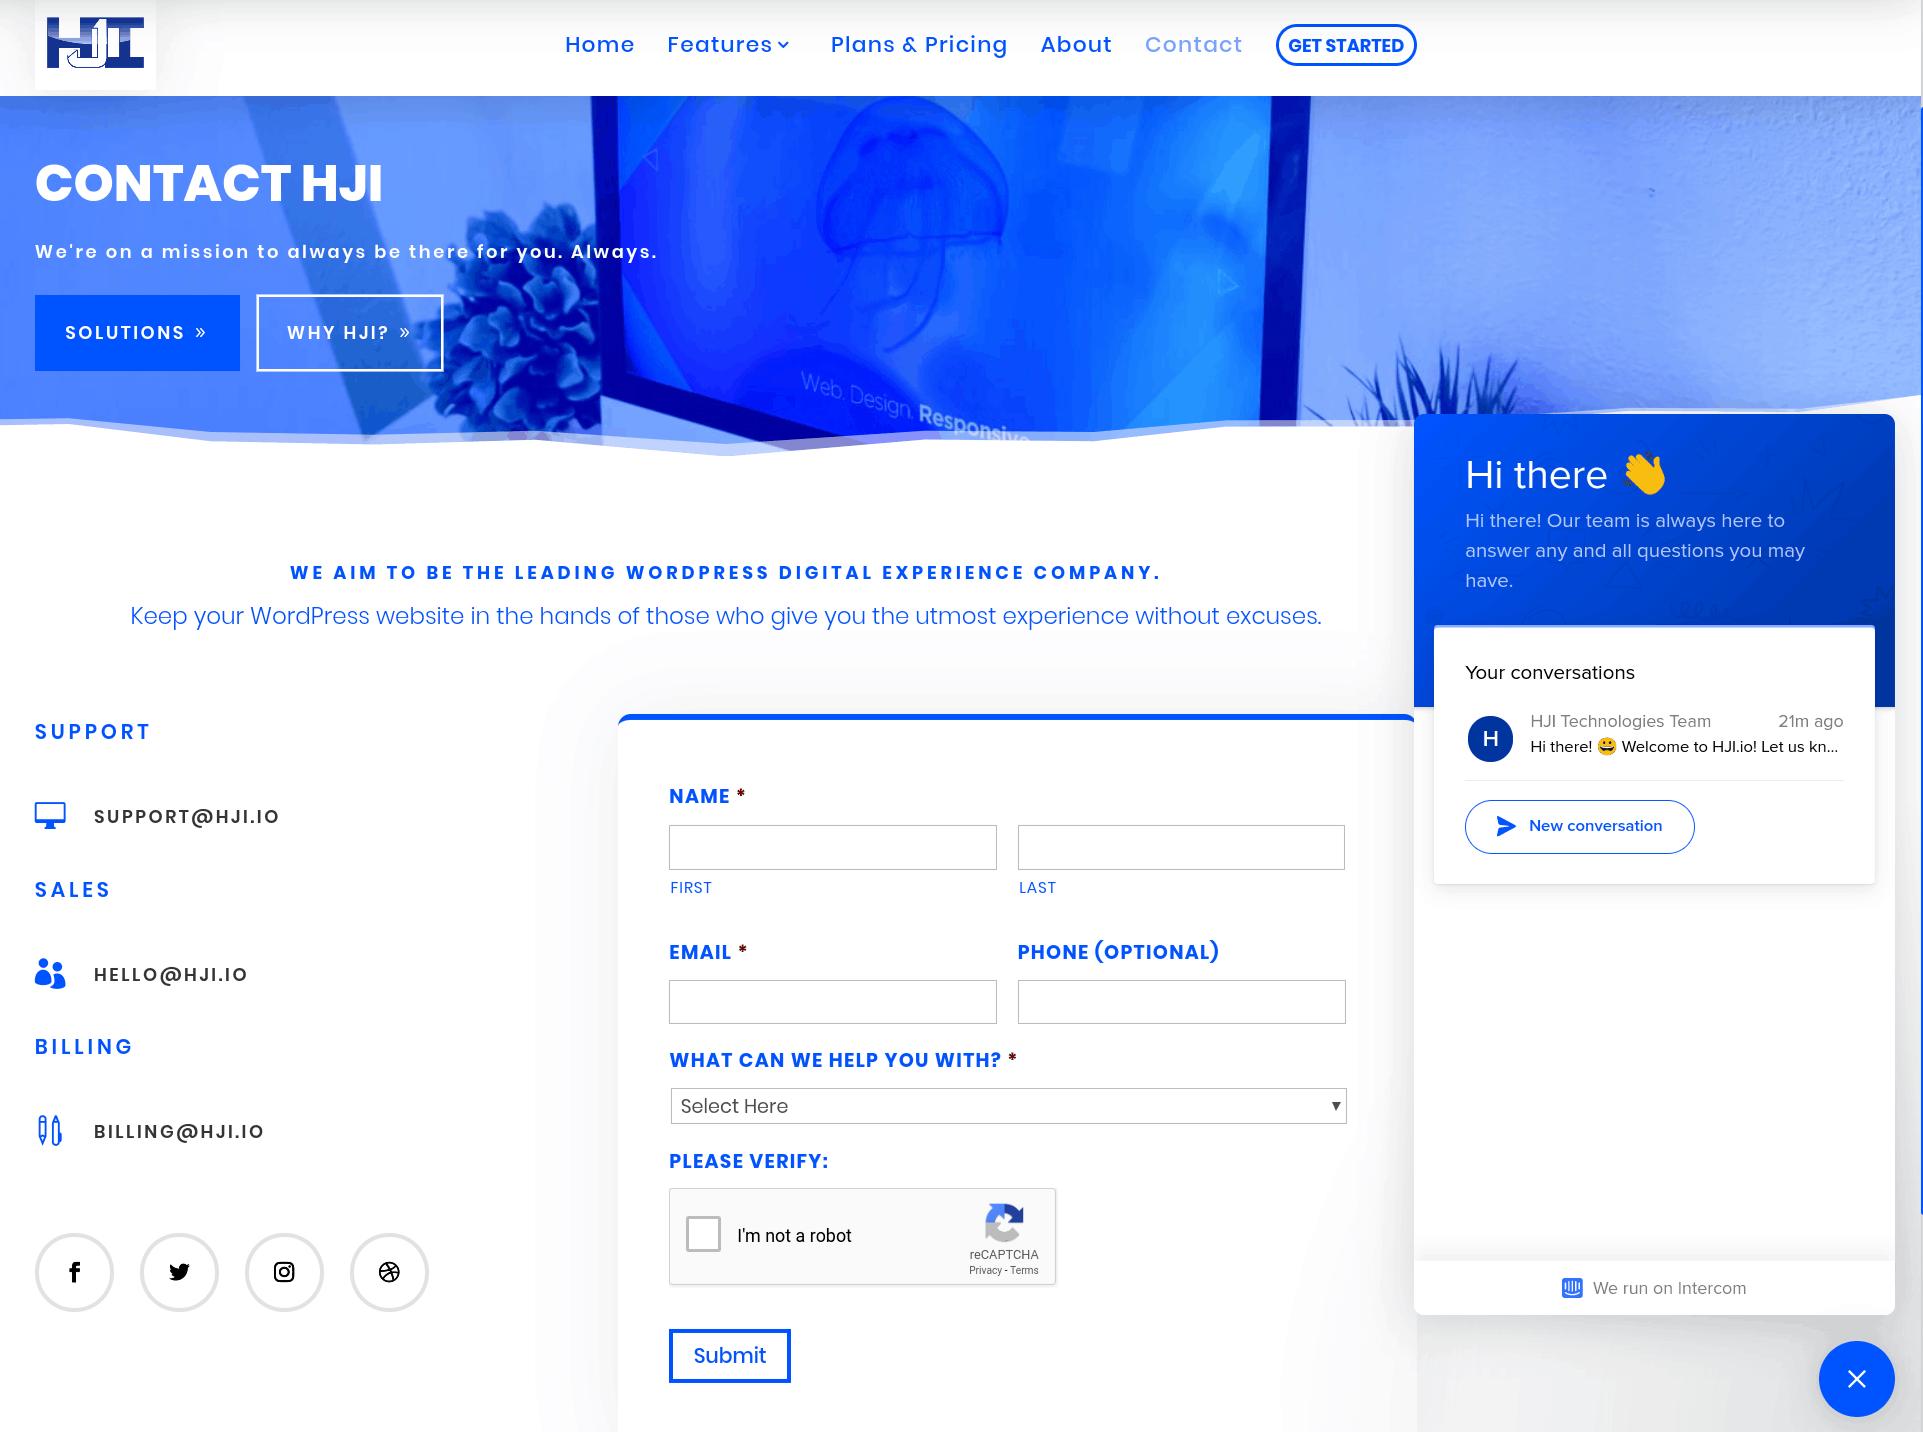 HJI Technologies